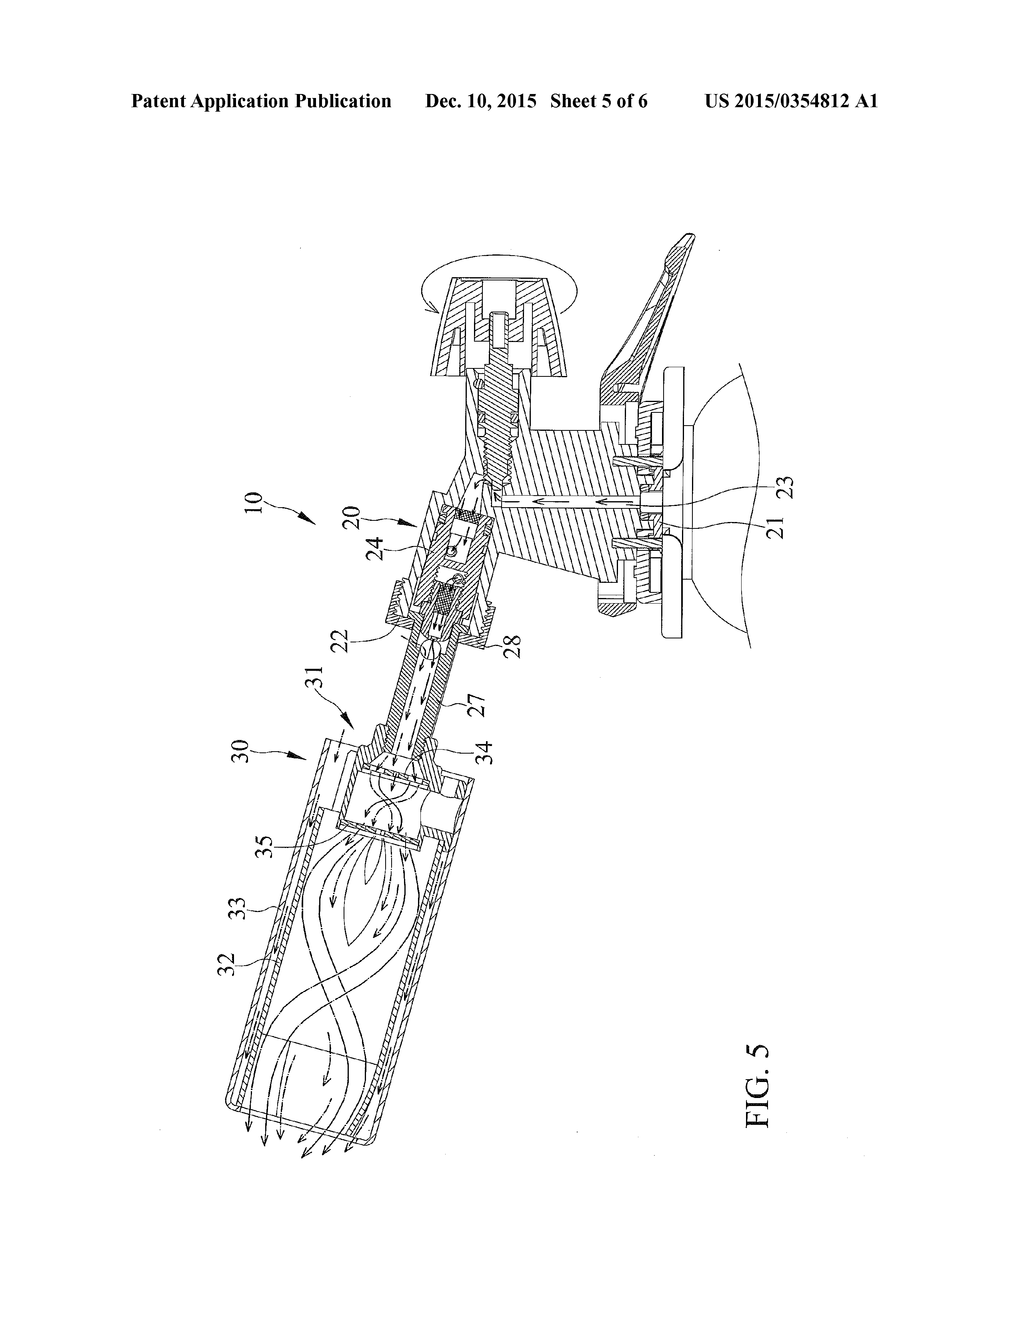 gas hot air gun head diagram schematic and image 06 rh patentsencyclopedia com